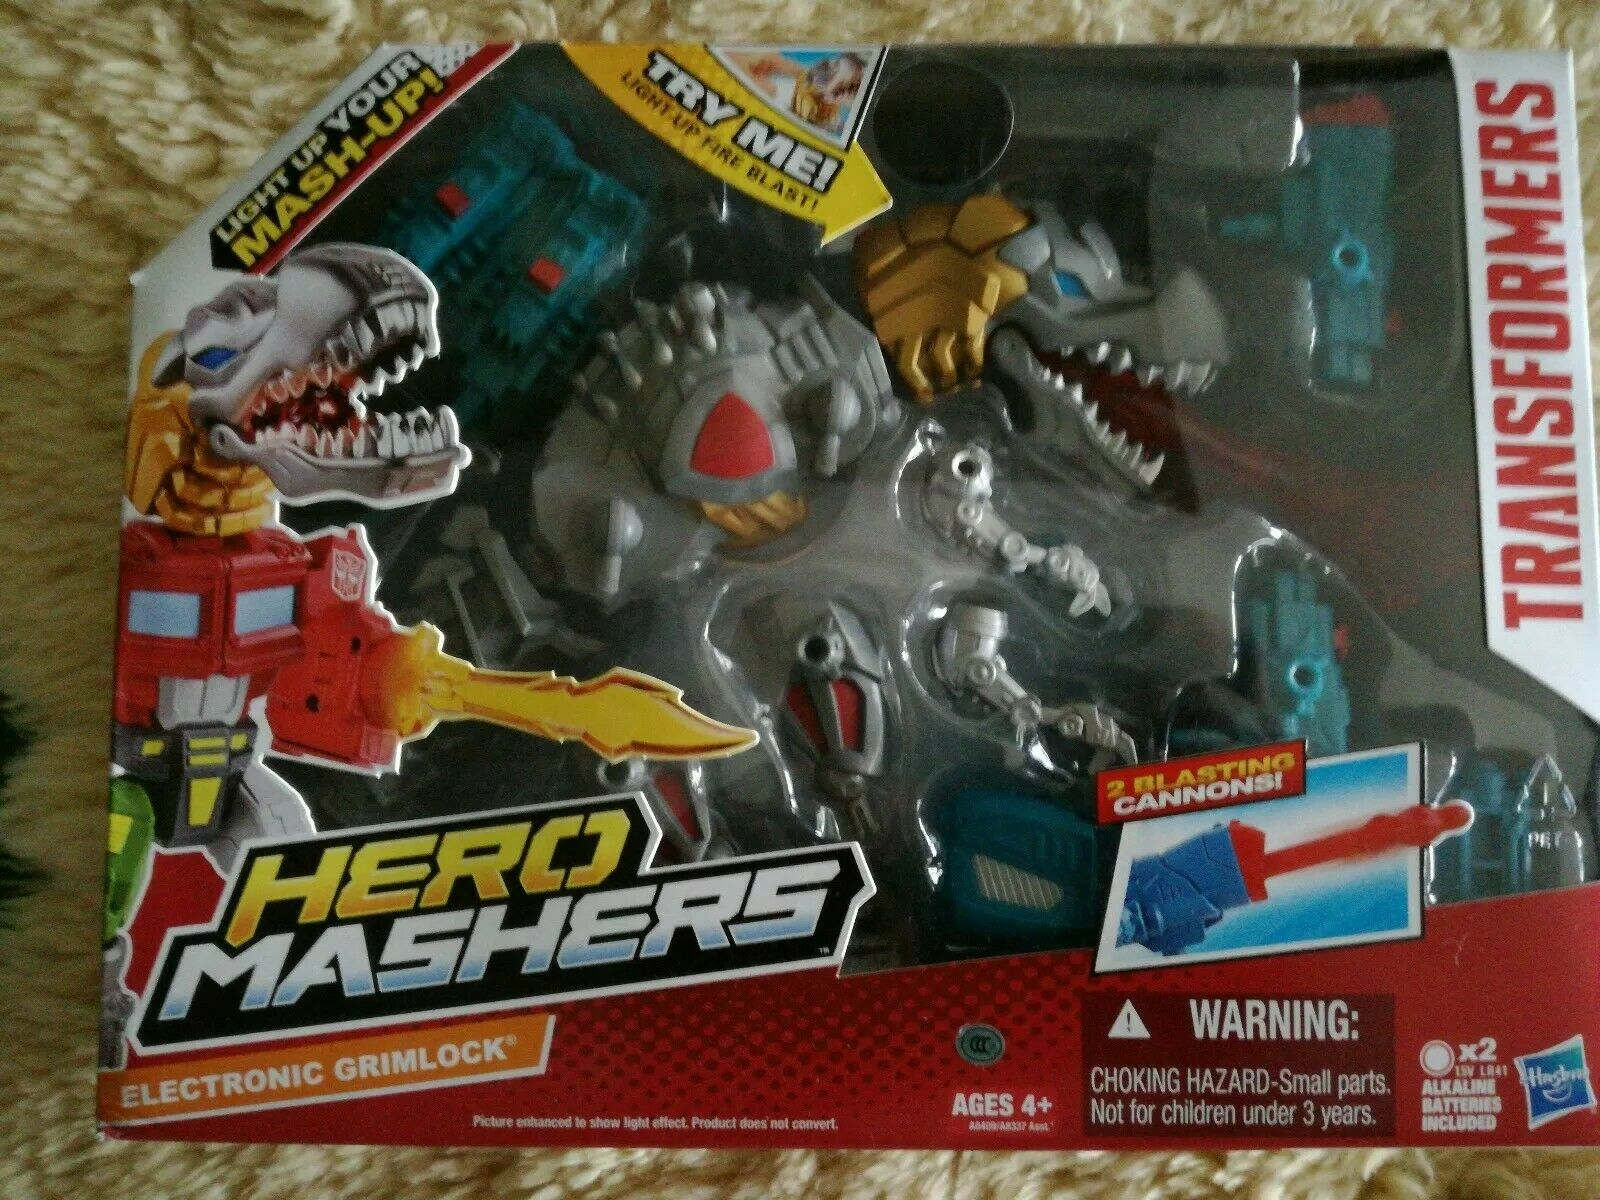 Electronic Grimlock TRANSFORMERS Hero MASHERS MASHERS MASHERS 9a3b5a